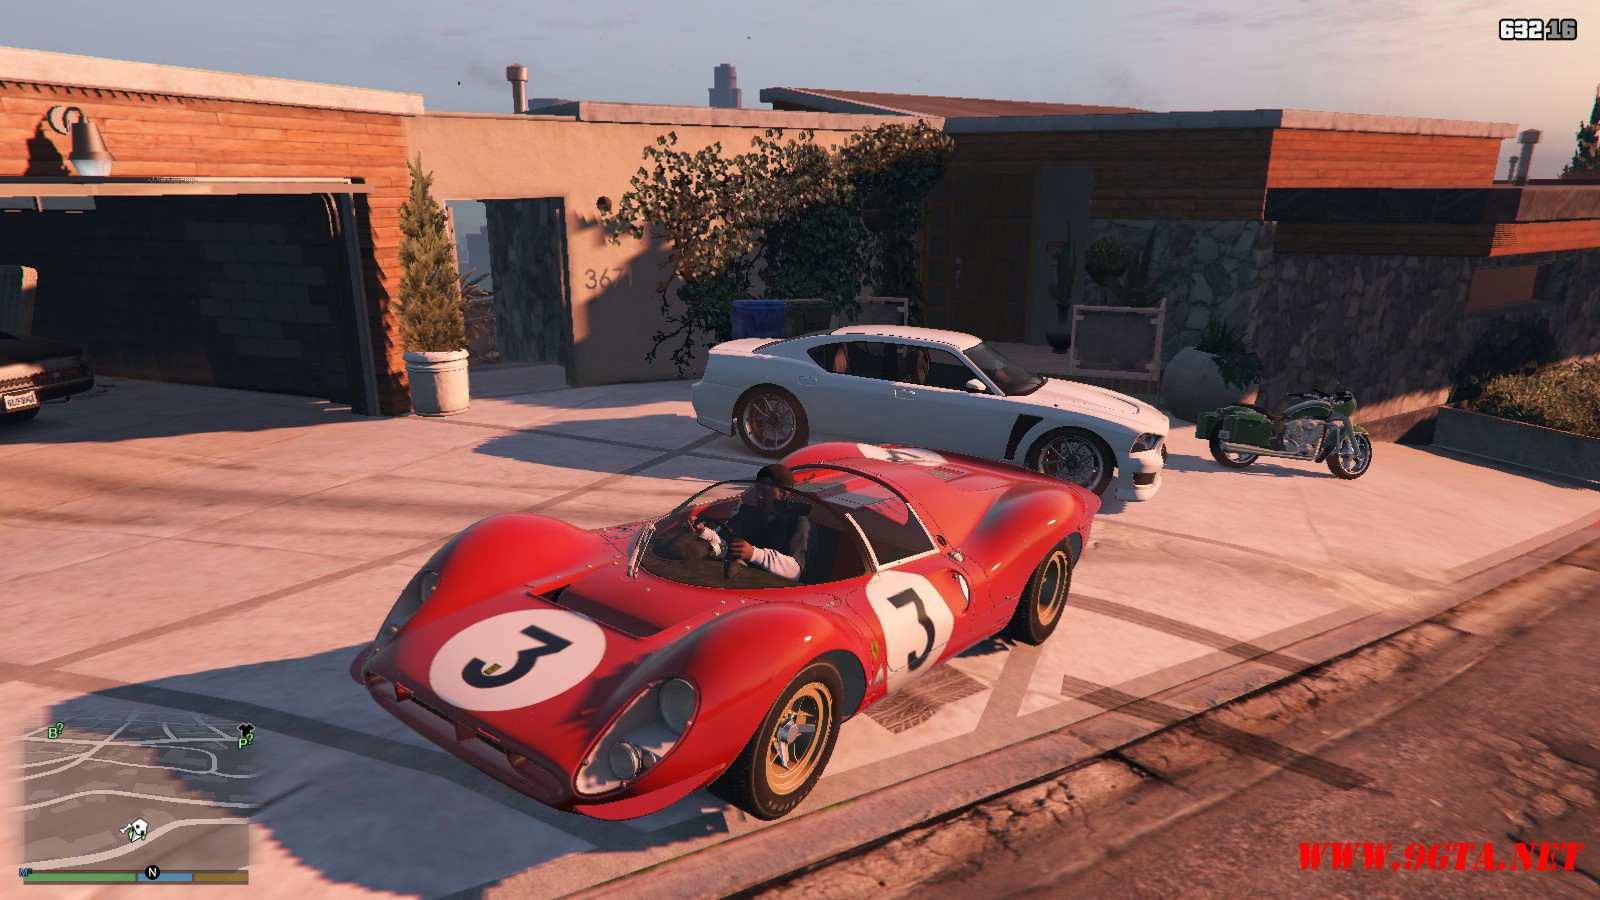 1967 Ferrari 330 P4 GTA5 Mods (2)